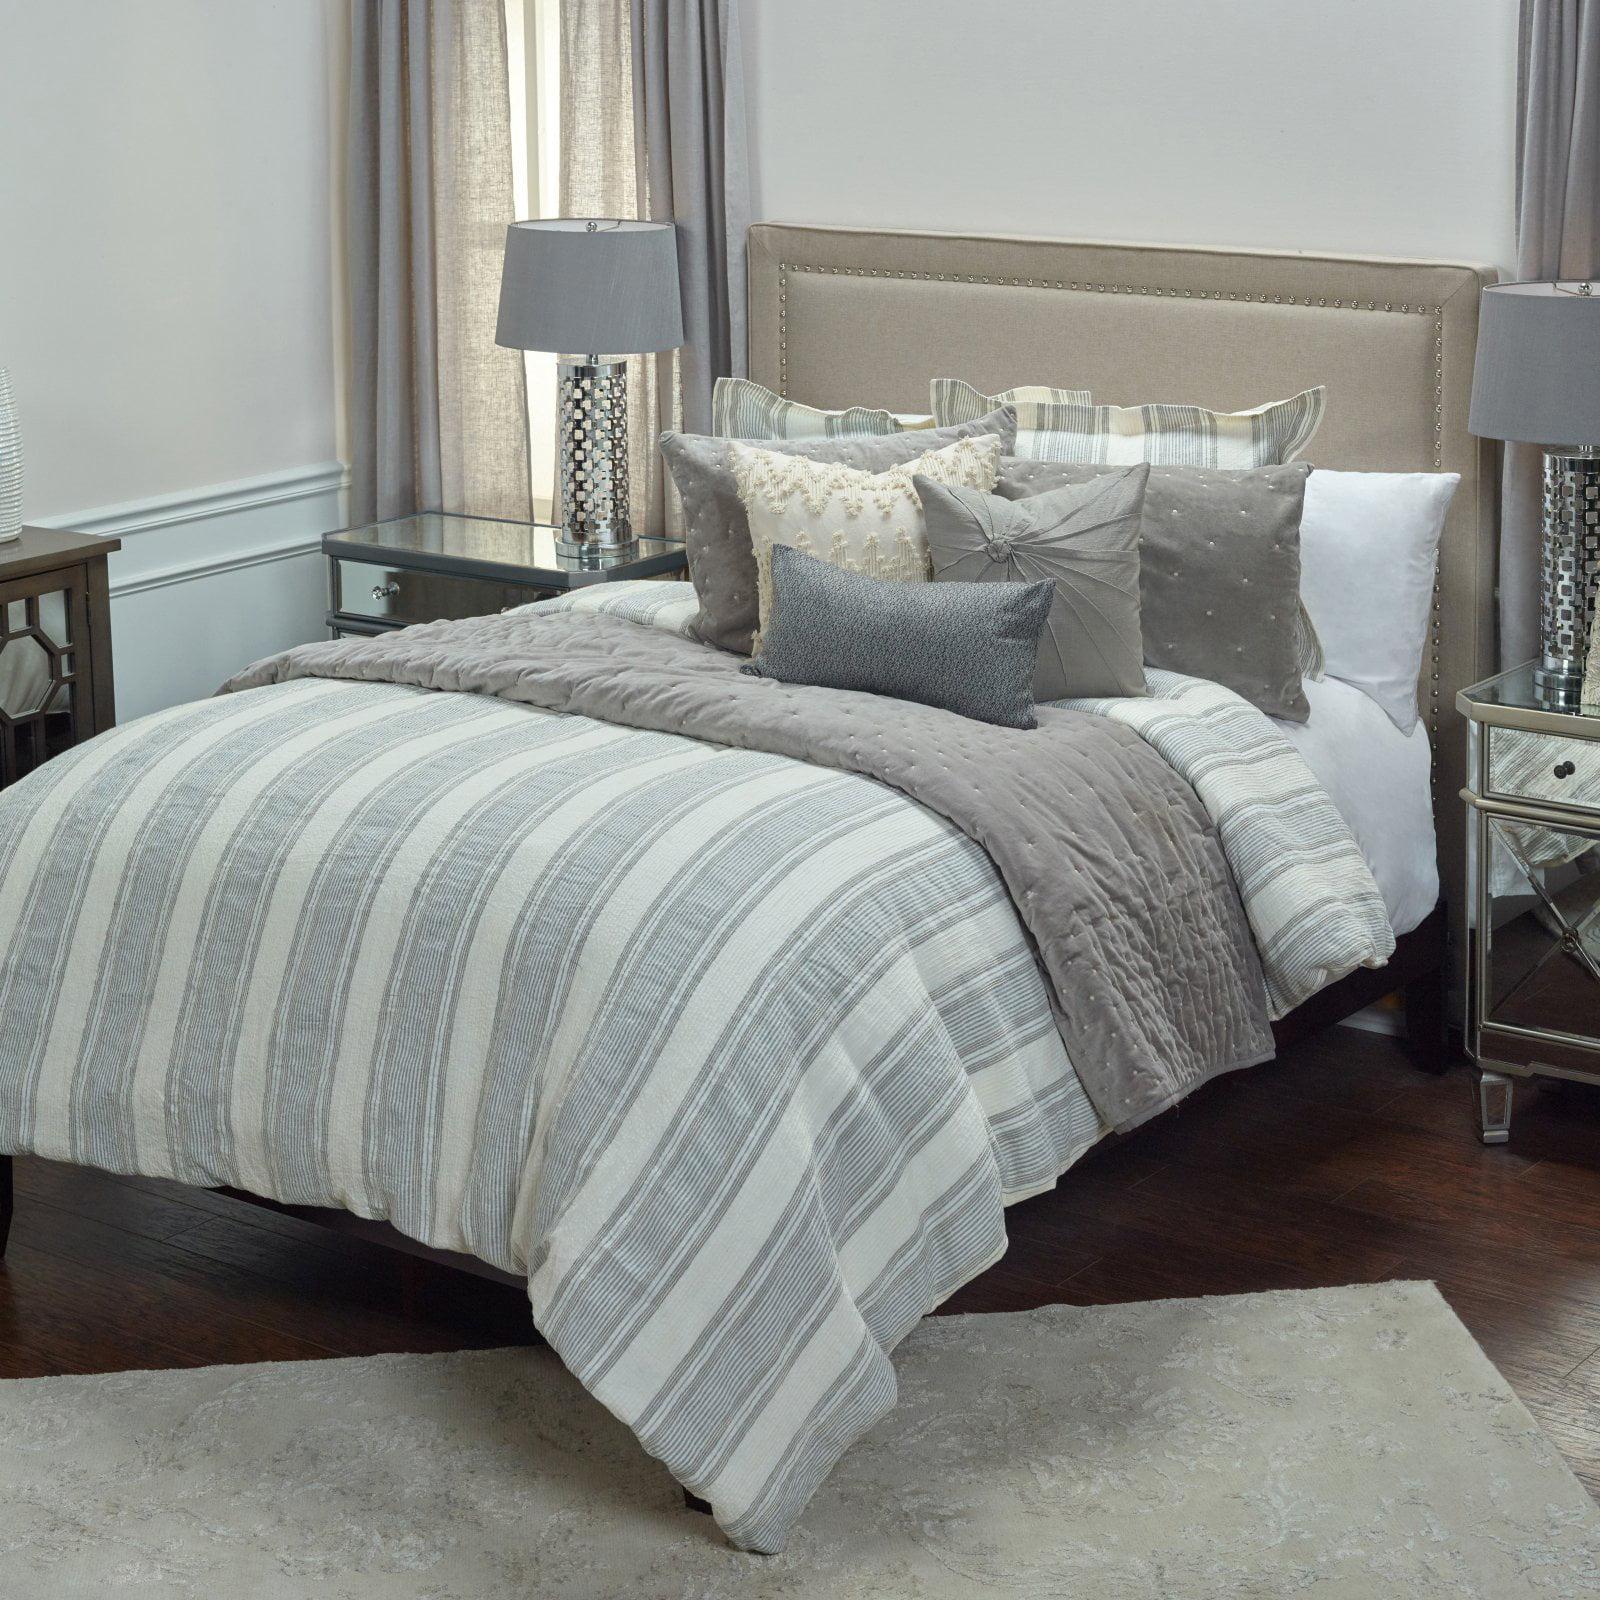 Rizzy Home Prescott Preserve Ivory Linen Duvet Bedding Cover Square (98x98)